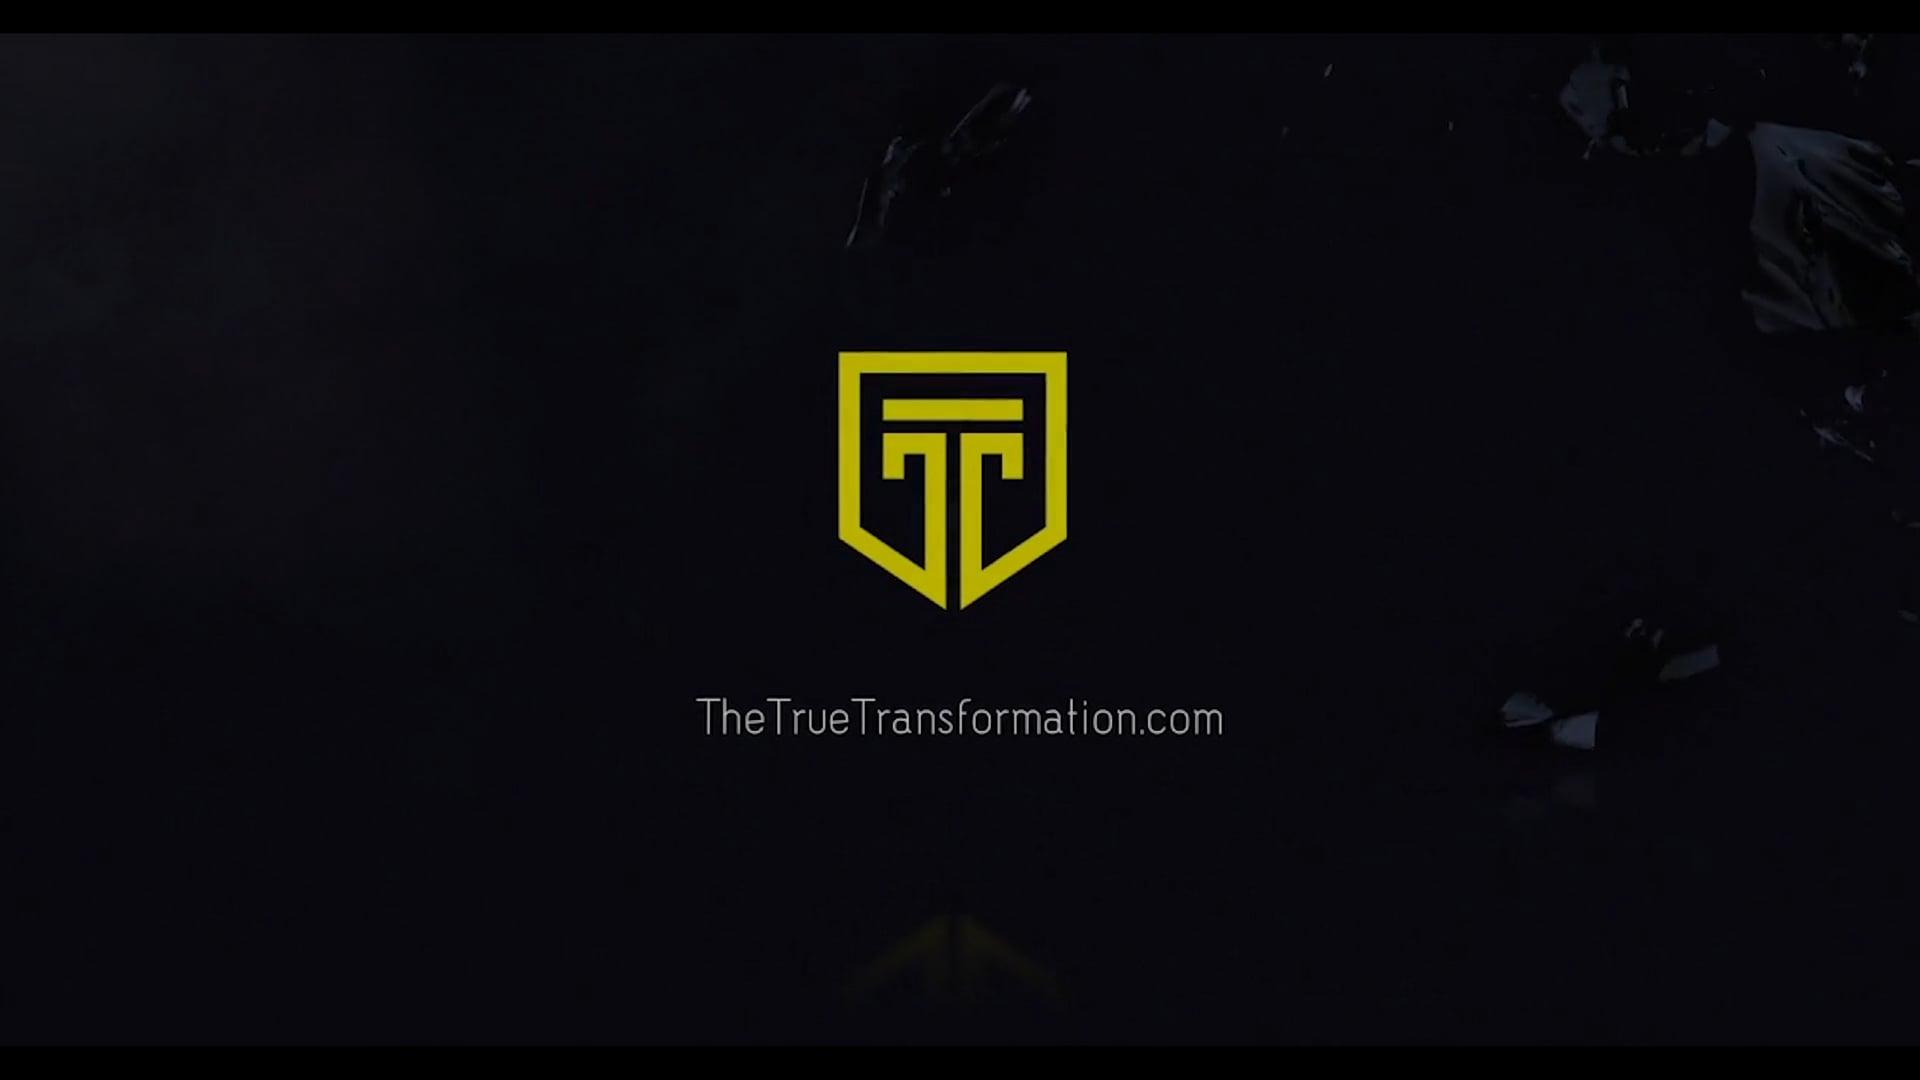 The True Transformation - Ad